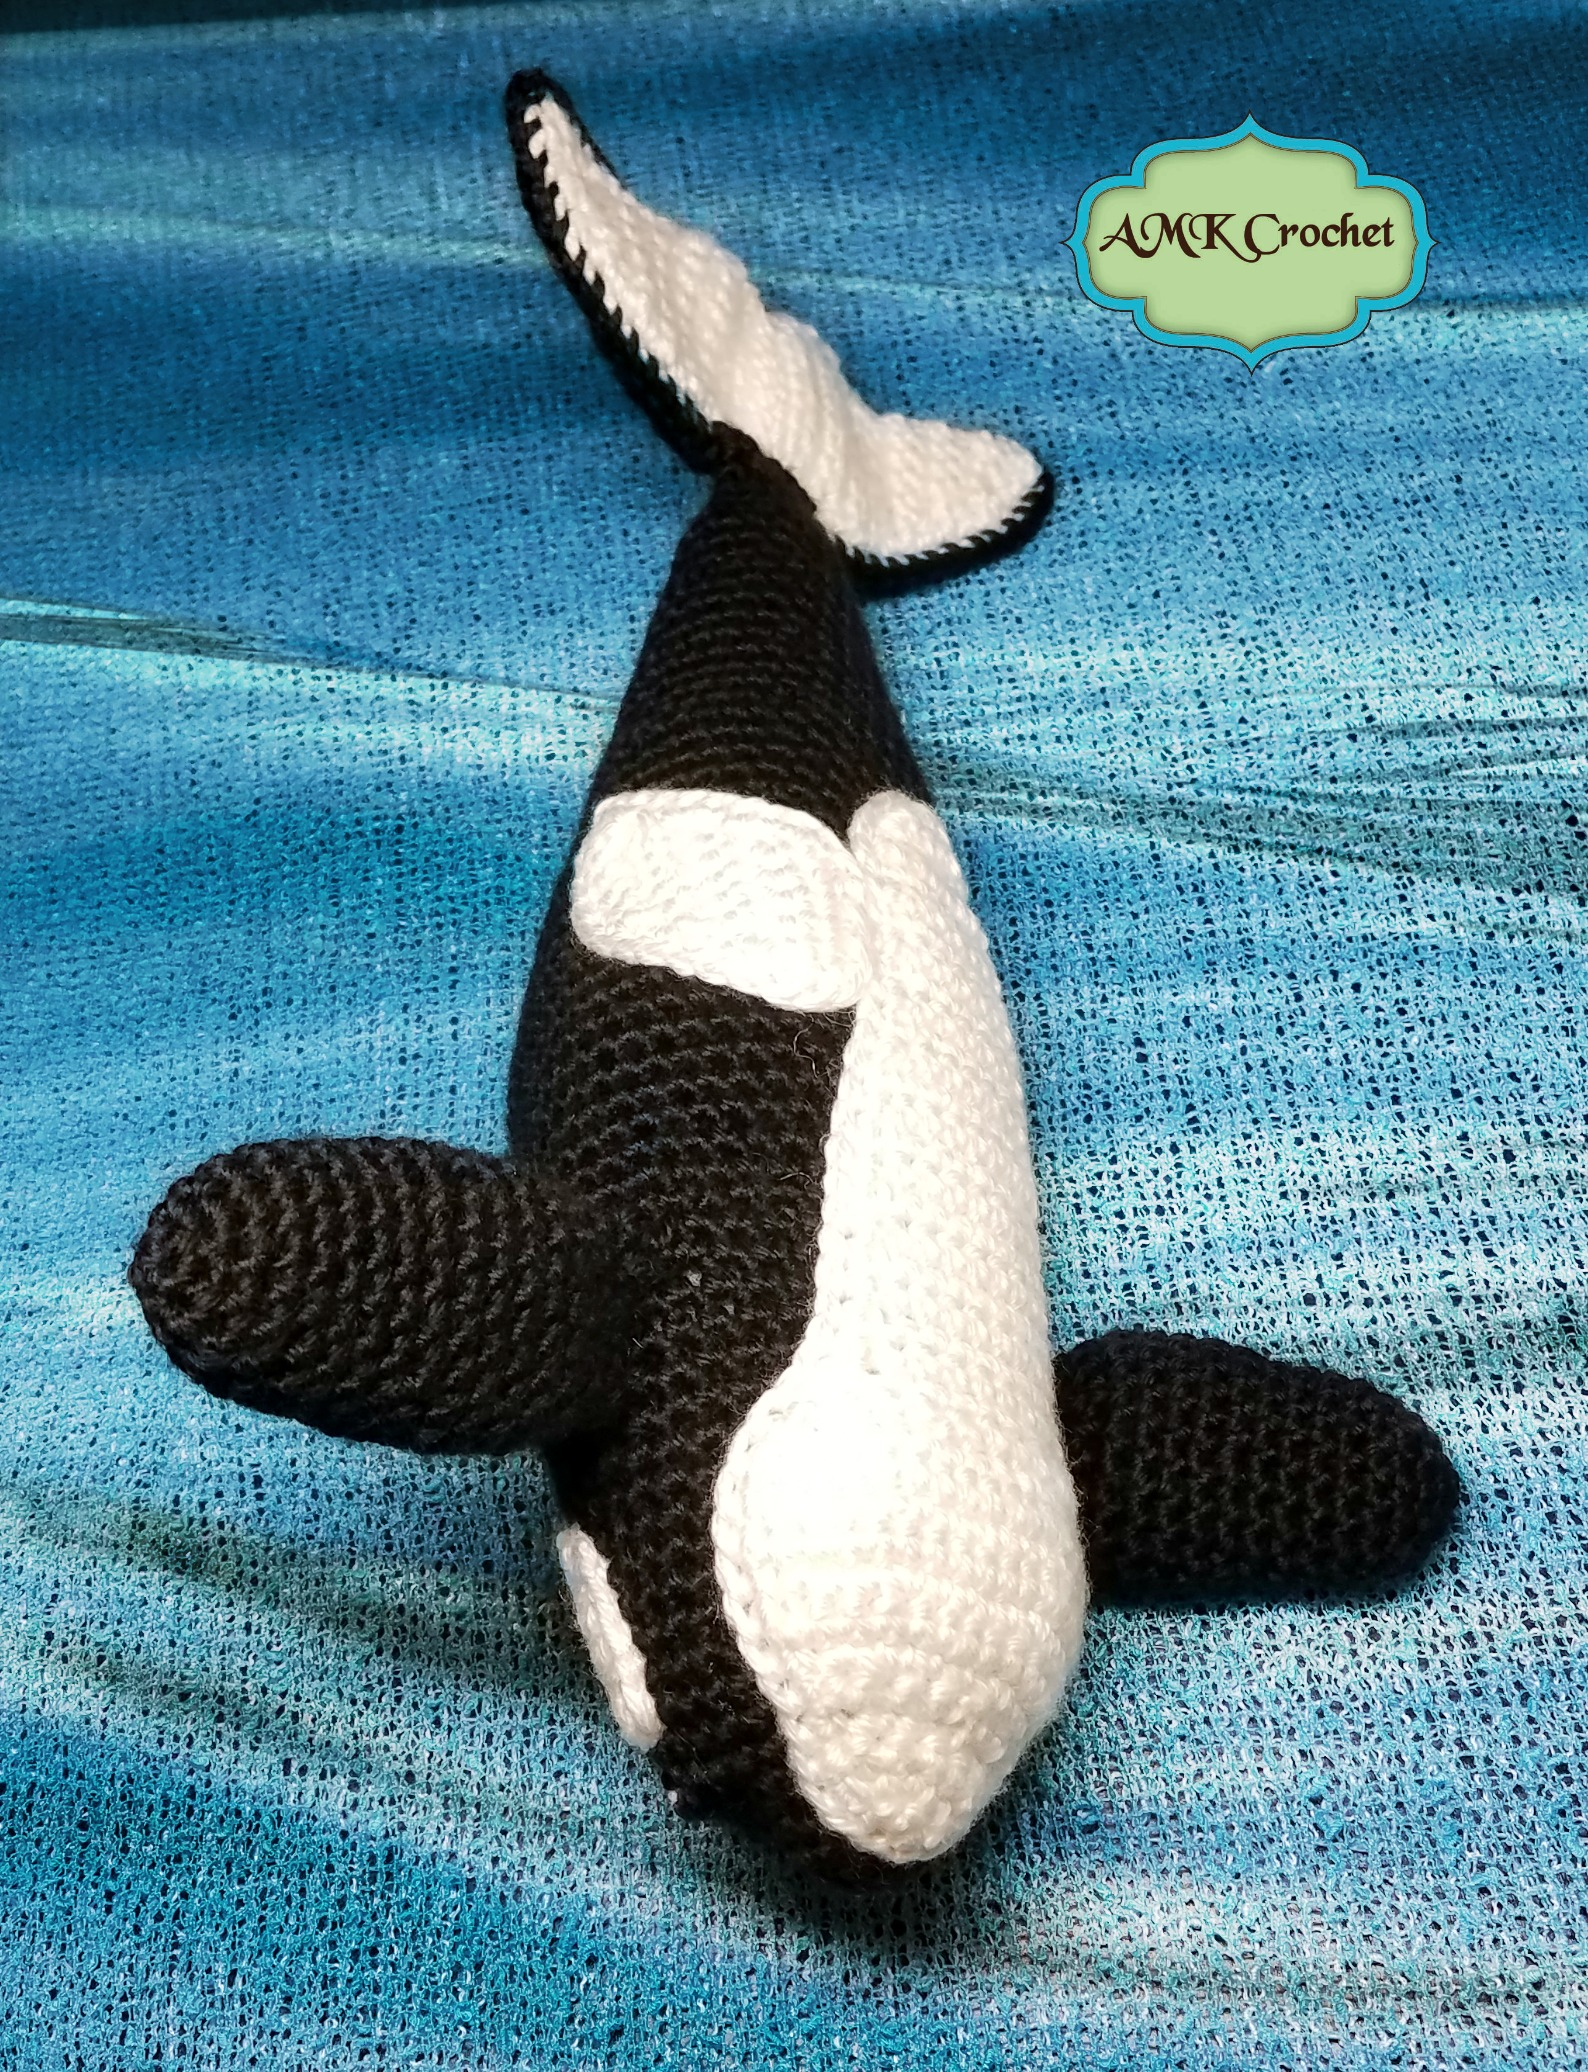 Crochet Orca (Killer Whale) Plush Toy Pattern | AMK Crochet